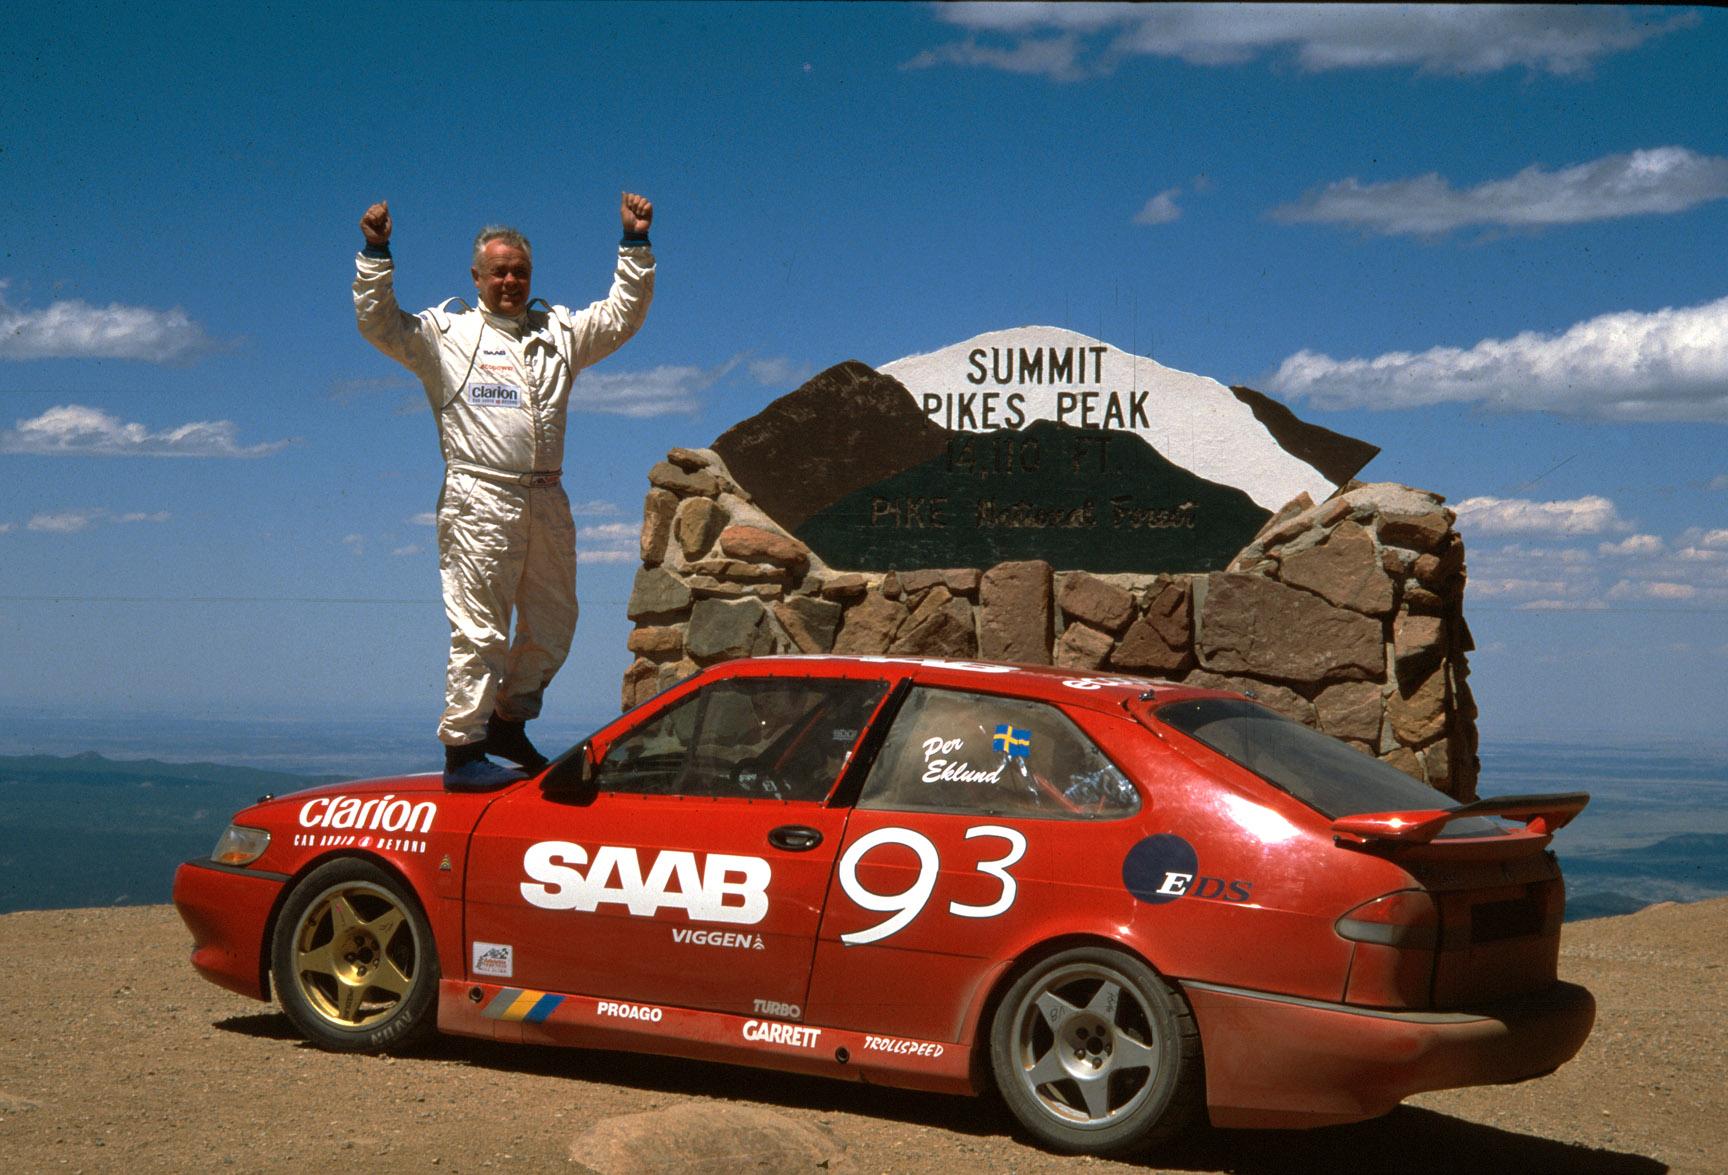 Per Eklund celebrating his record-breaking win, Pikes Peak 2000.